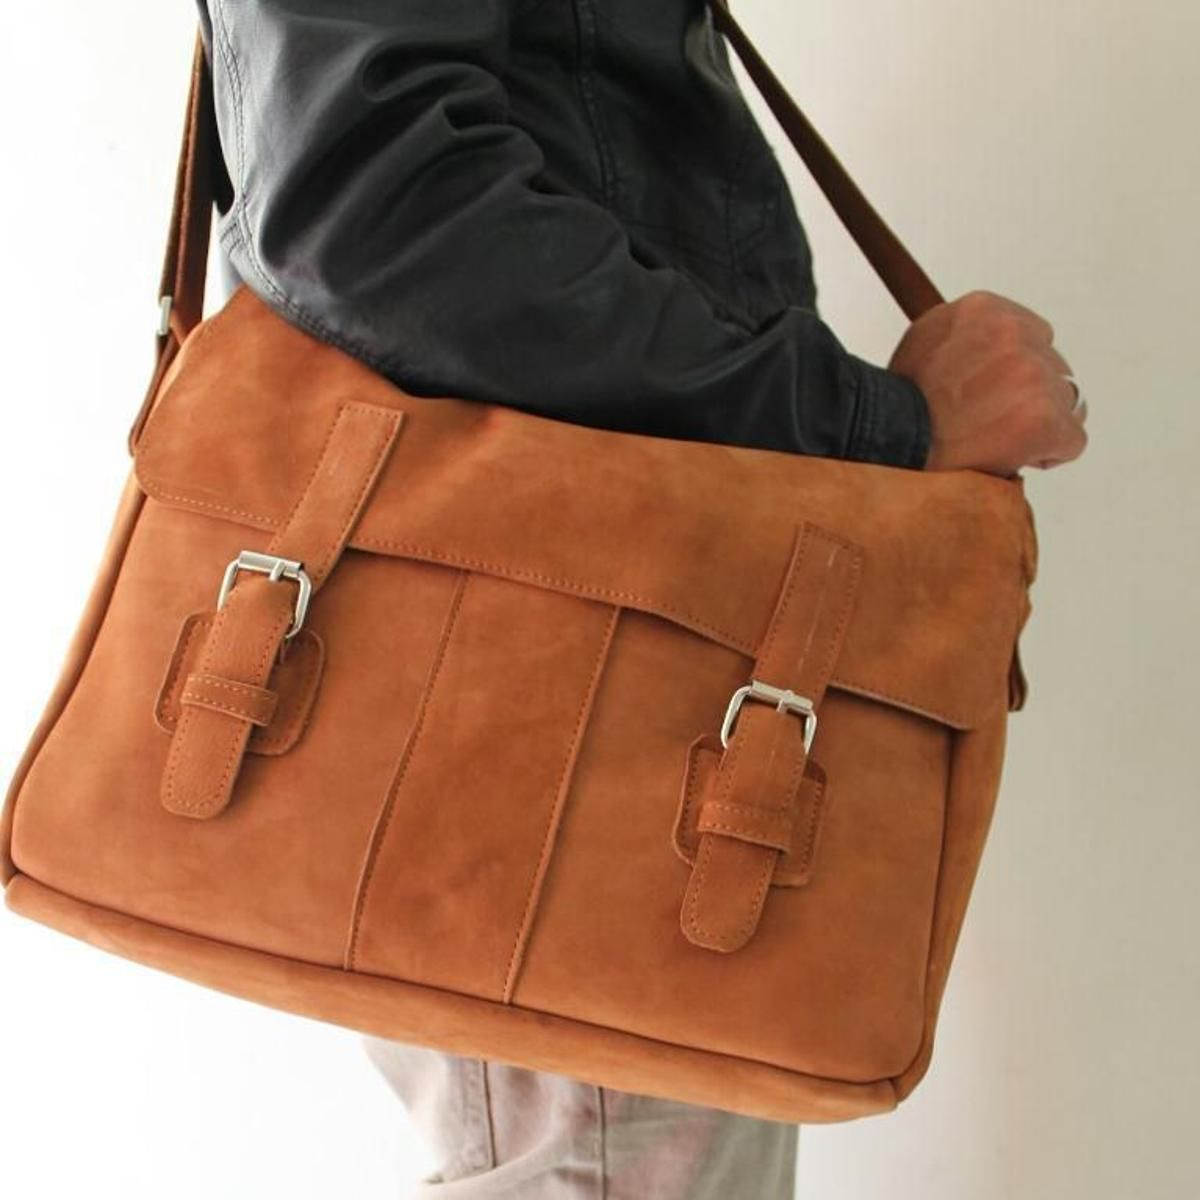 Leather Bag For Men Craftsy Mens Leather Bag Diy Leather